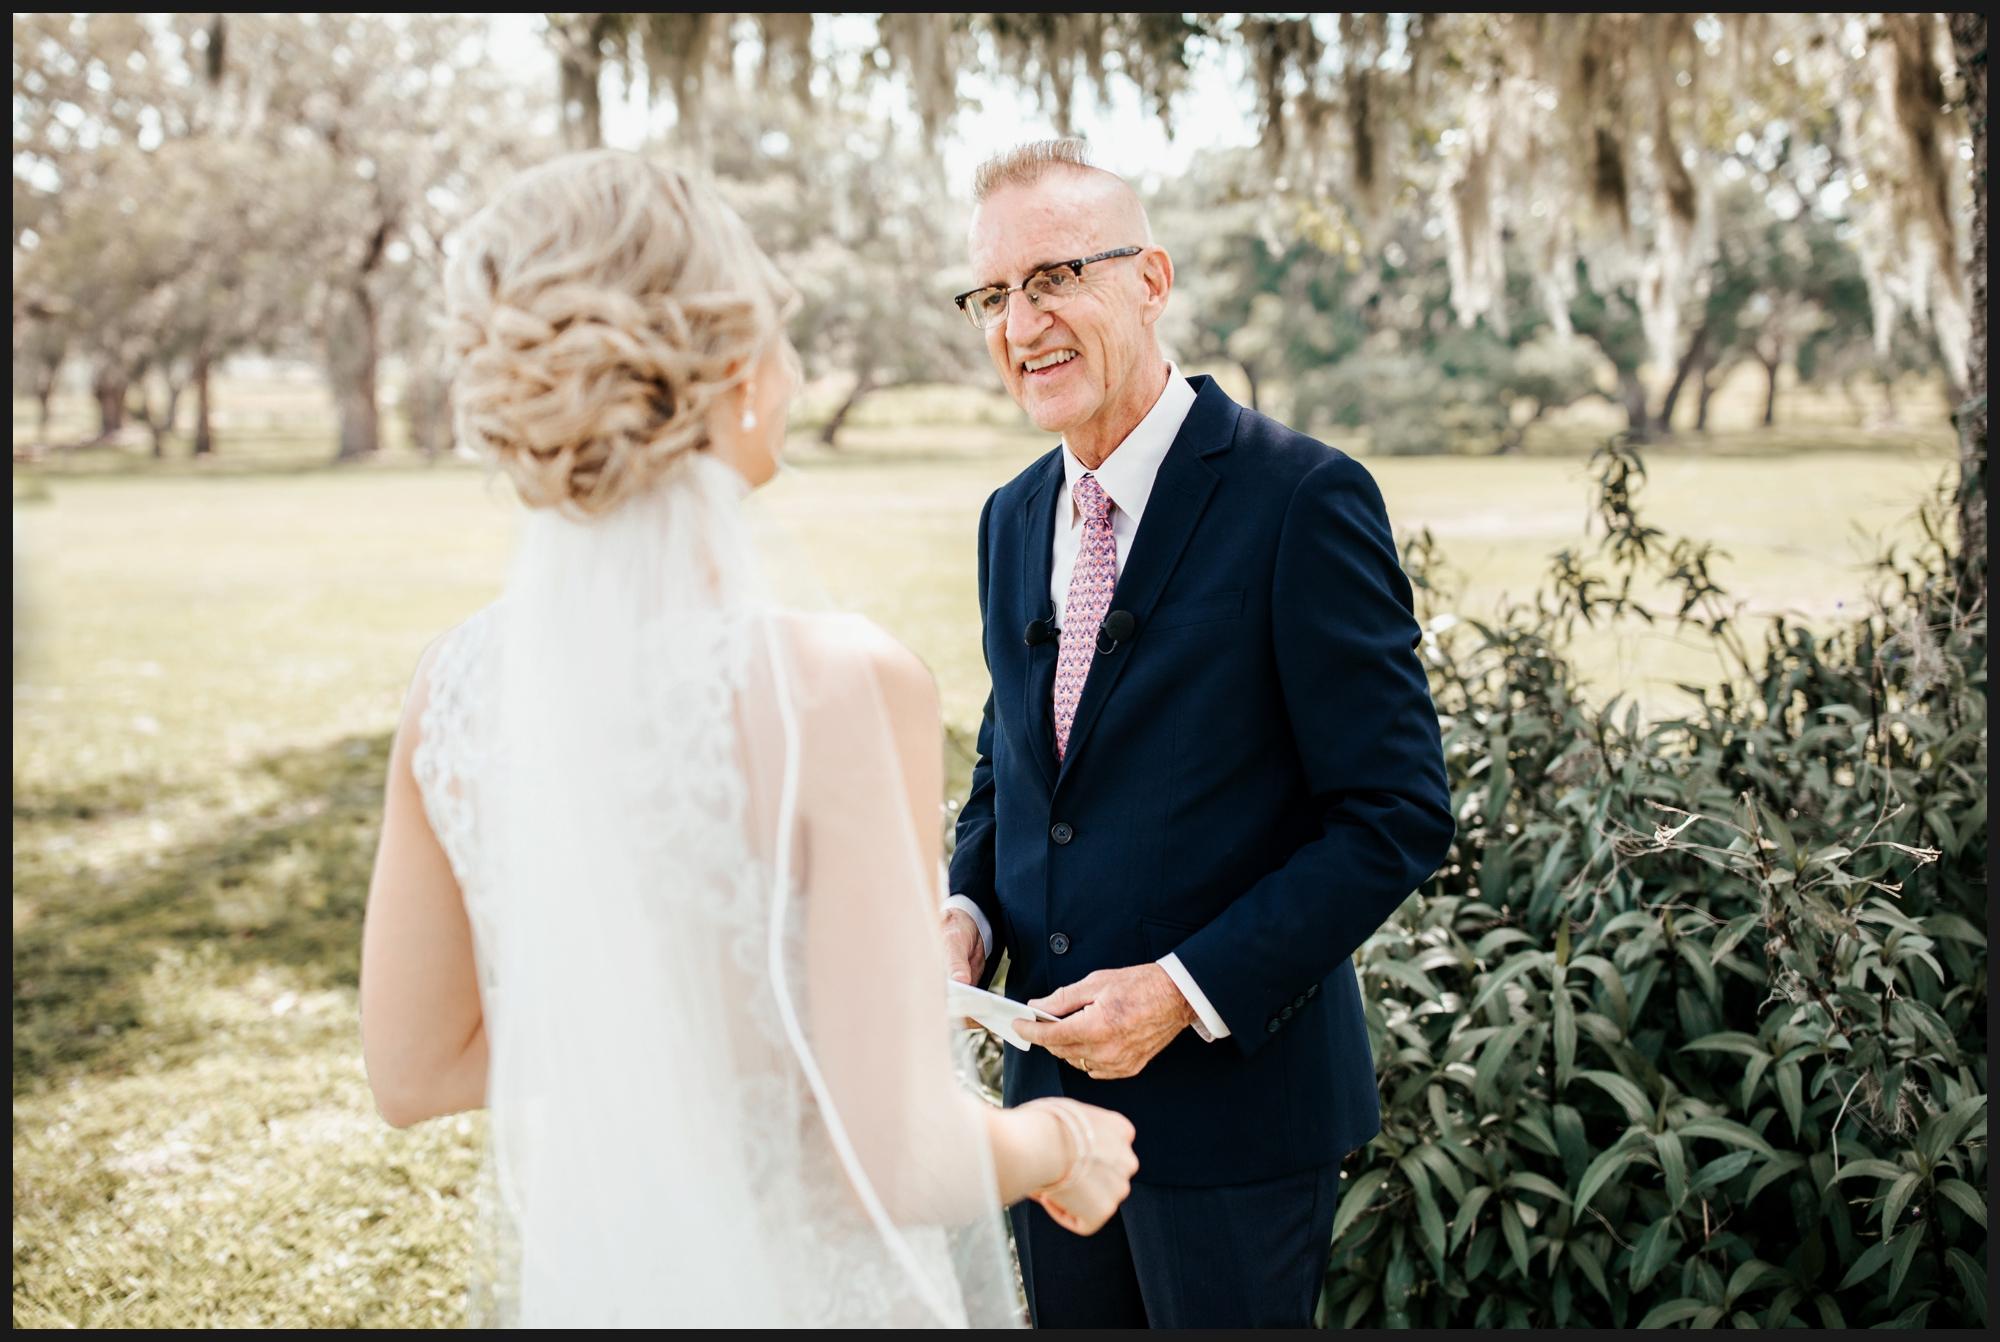 Orlando-Wedding-Photographer-destination-wedding-photographer-florida-wedding-photographer-hawaii-wedding-photographer_0589.jpg